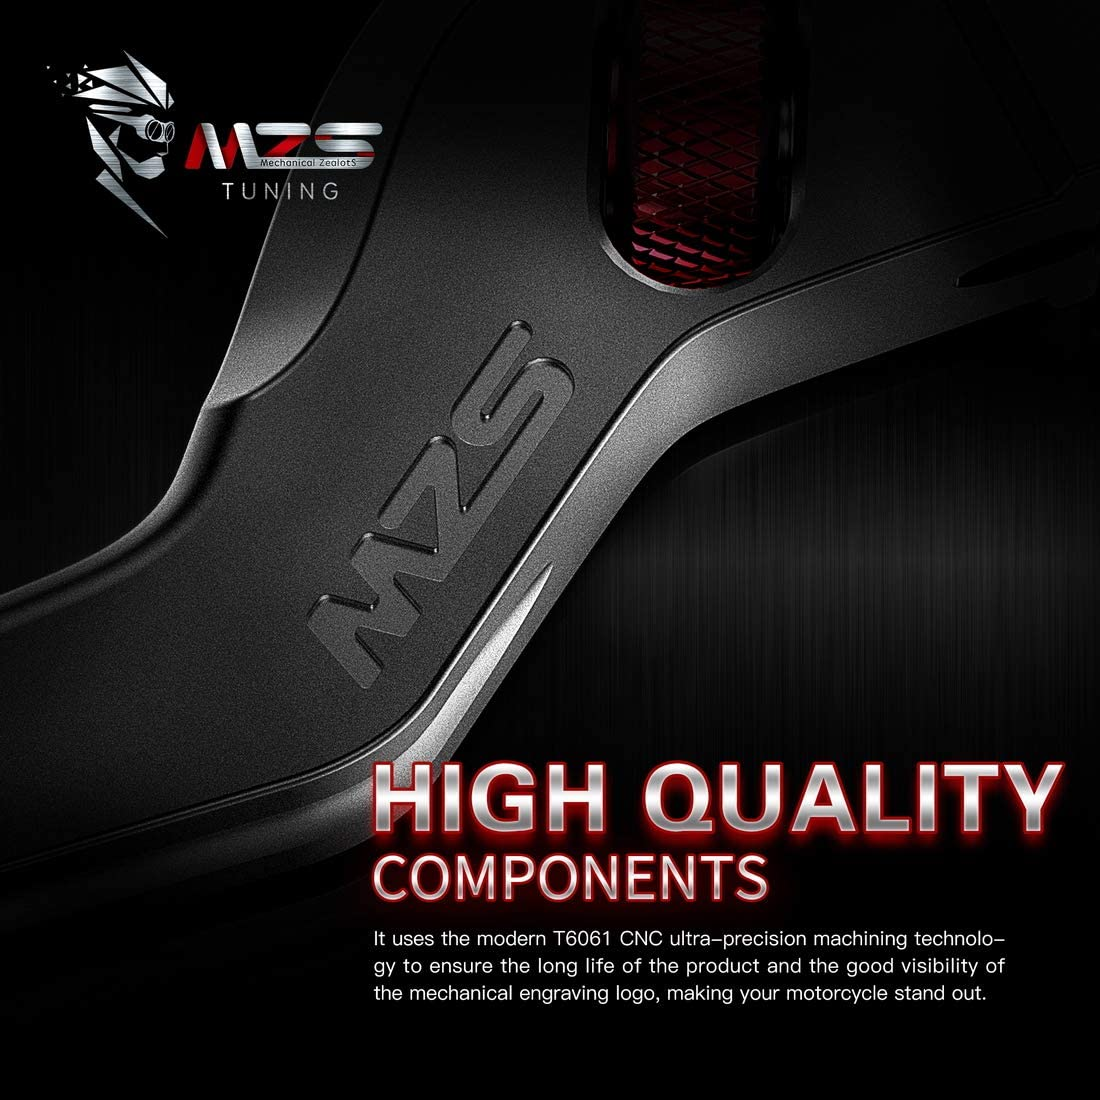 MZS Short Levers Brake Clutch Wheel Roller Adjustment Blue CNC Compatible with Vespa GT200 GTS250 GTS300 LX50 LX150 Primavera 50 150 S50 S150 Sprint50